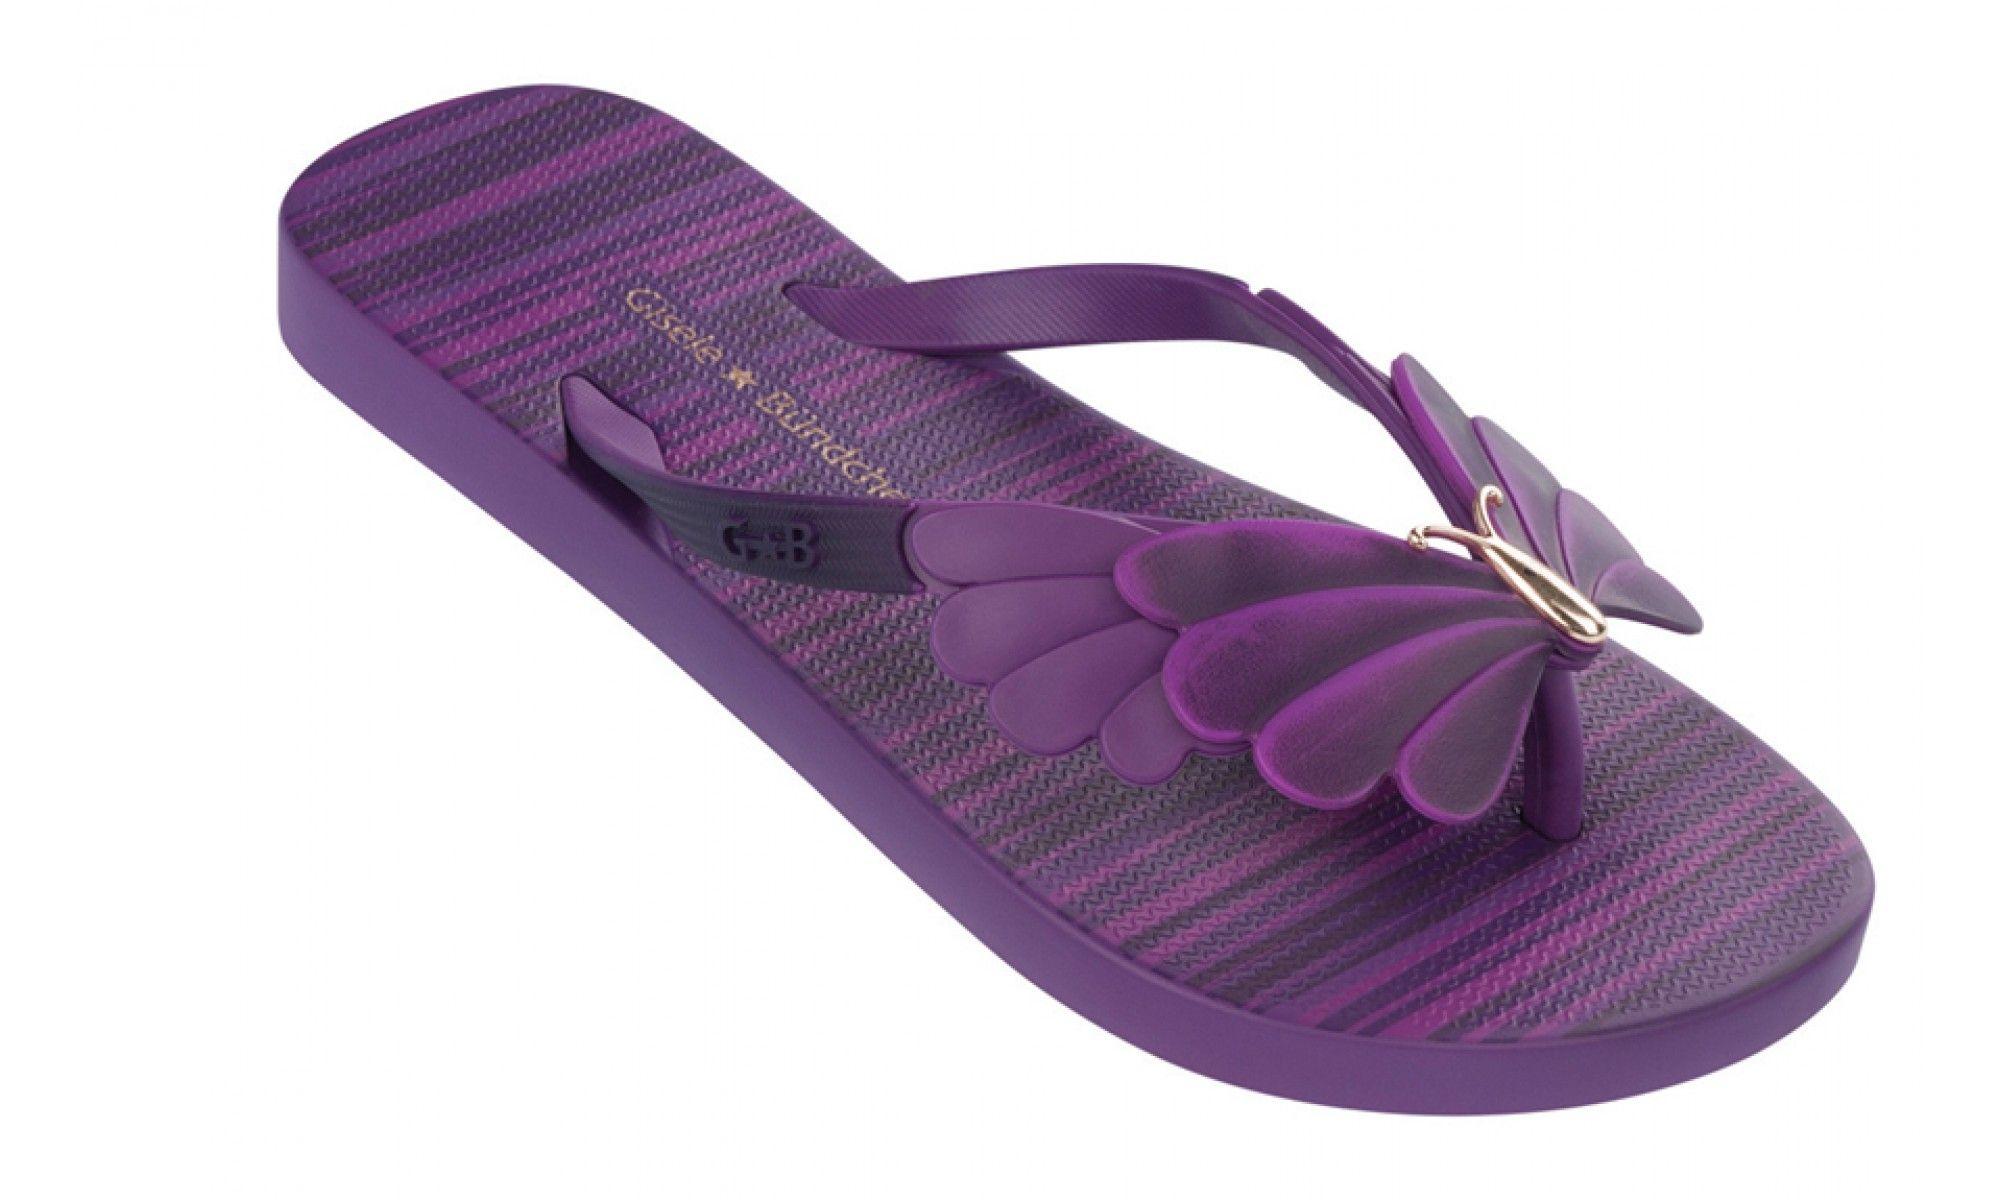 purple flip flops | Home » iPANEMA Gisele Bundchen Sunrise Purple Ladies Flip Flops